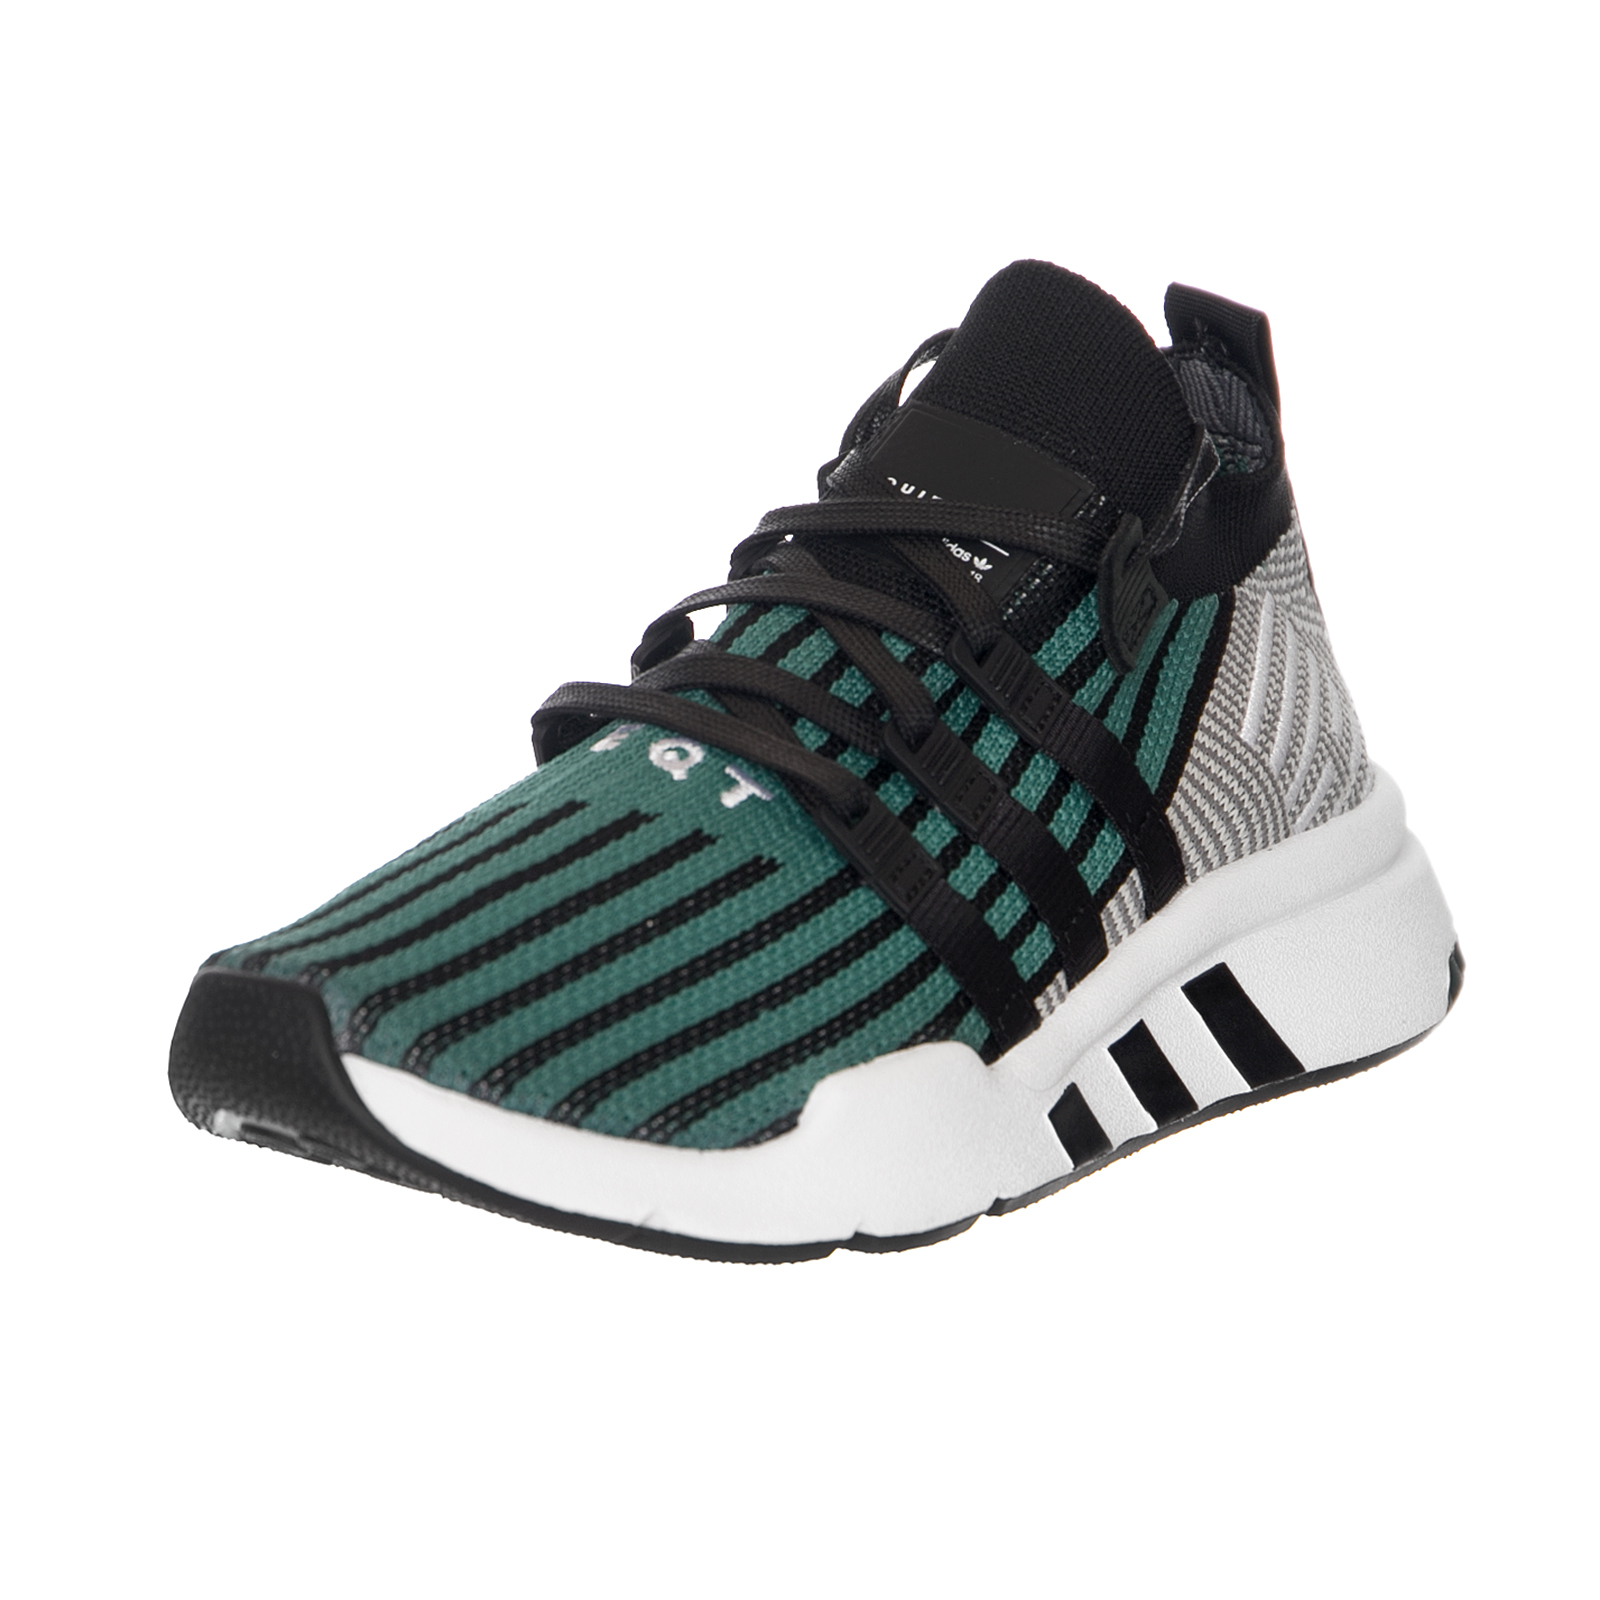 reputable site 4cfa6 8cf3d Zapatillas de Adidas Eqt soporte Adv Mid negro negro verde negro